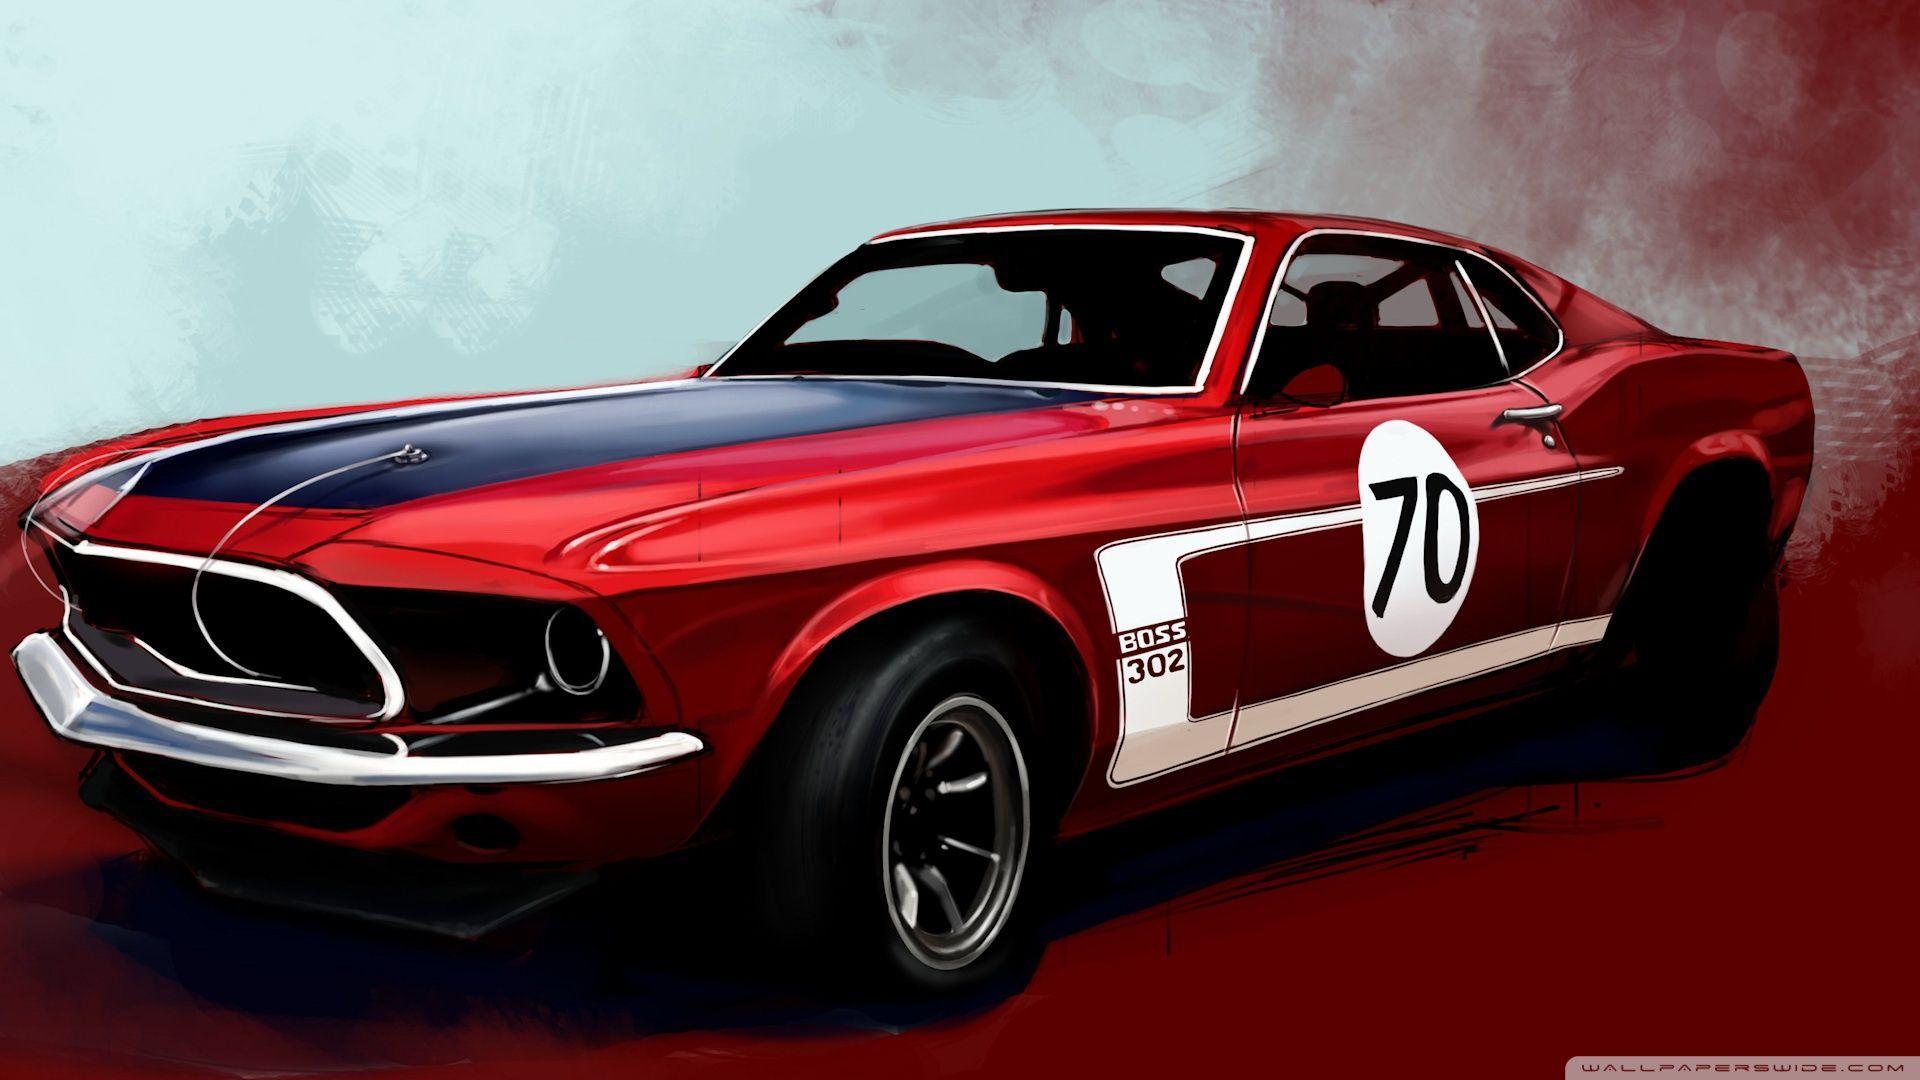 28+ Classic Car Wallpaper For Desktop Wallpapers